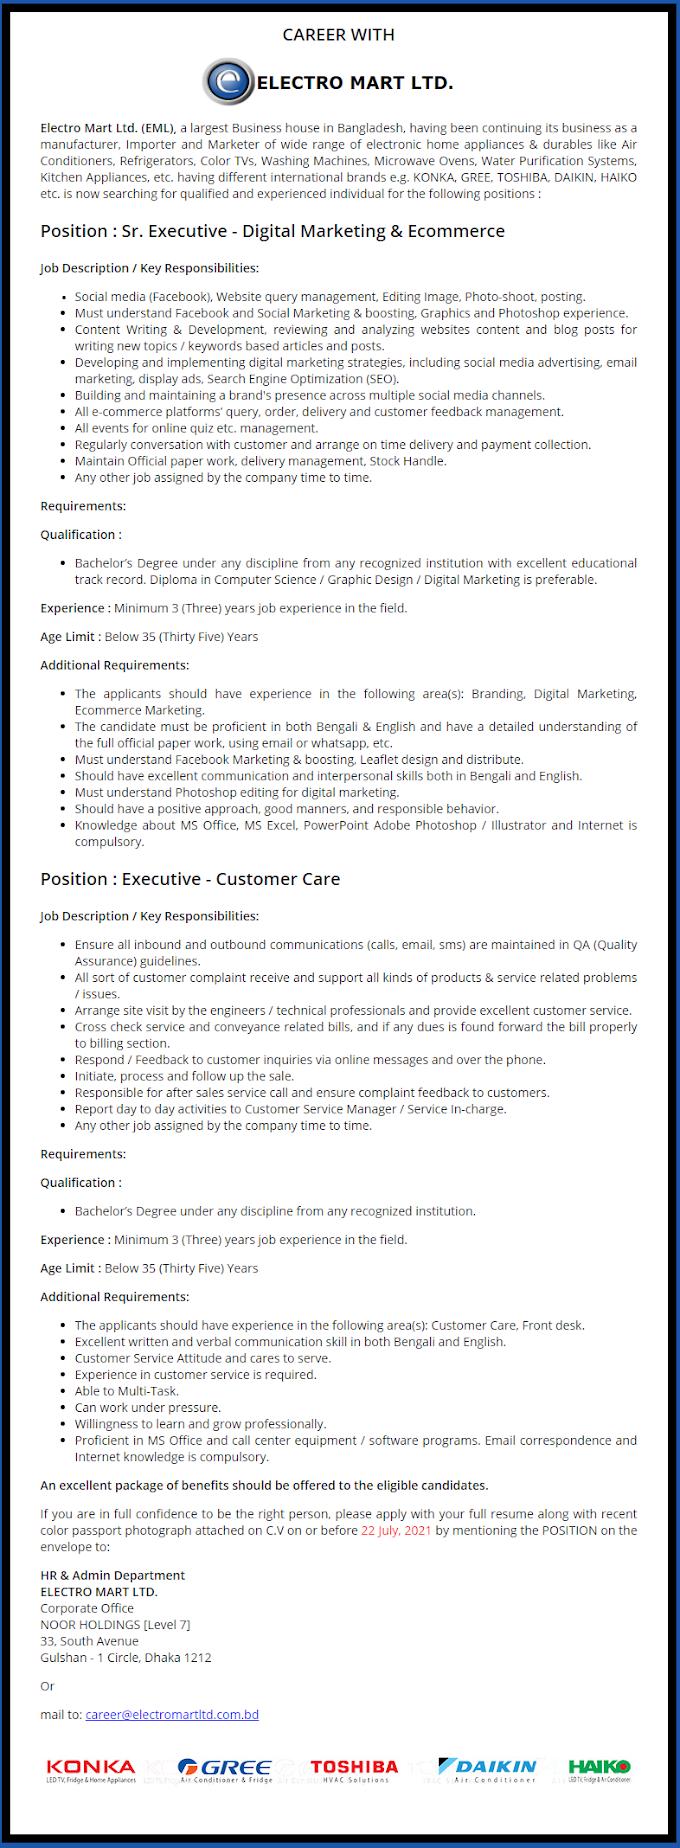 Electro Mart Ltd Job Circular 2021